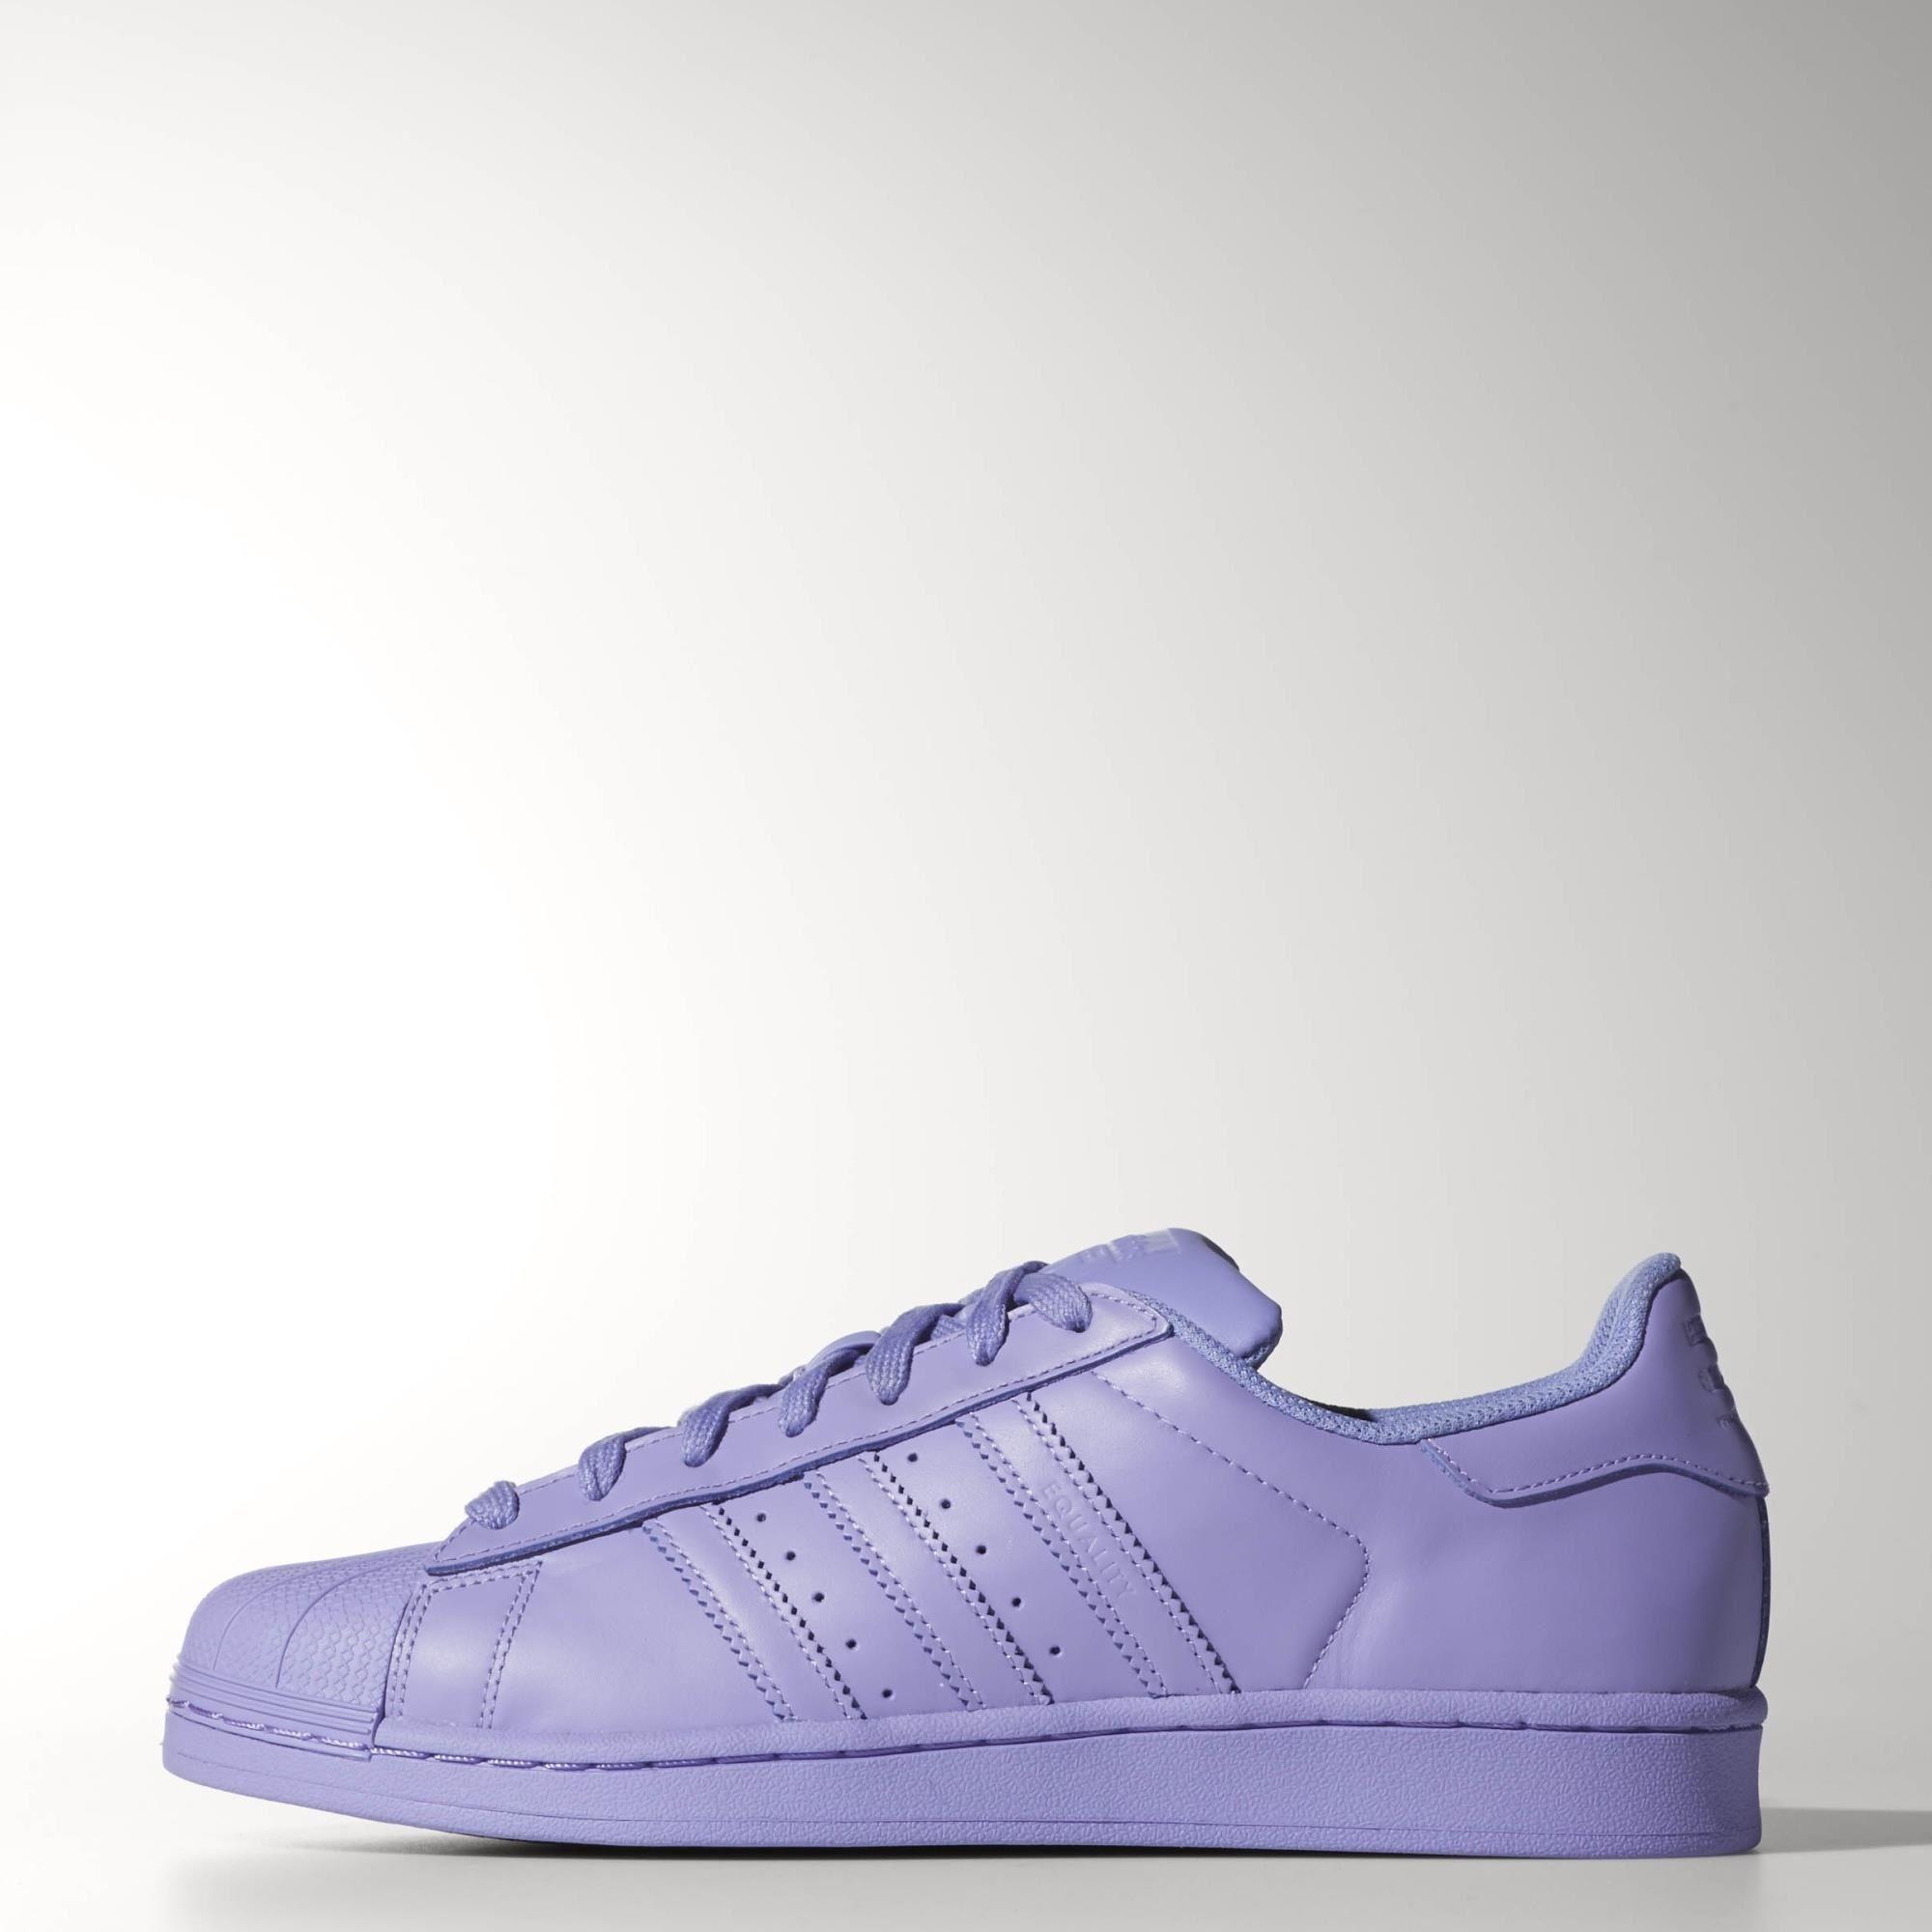 finest selection 01515 f7ddc ... supercolor pack shoes ec1b0 3044f official adidas superstar supercolor  pack shoes ec1b0 3044f  coupon code zapatos de adidas españa tamaño para  hombre ...